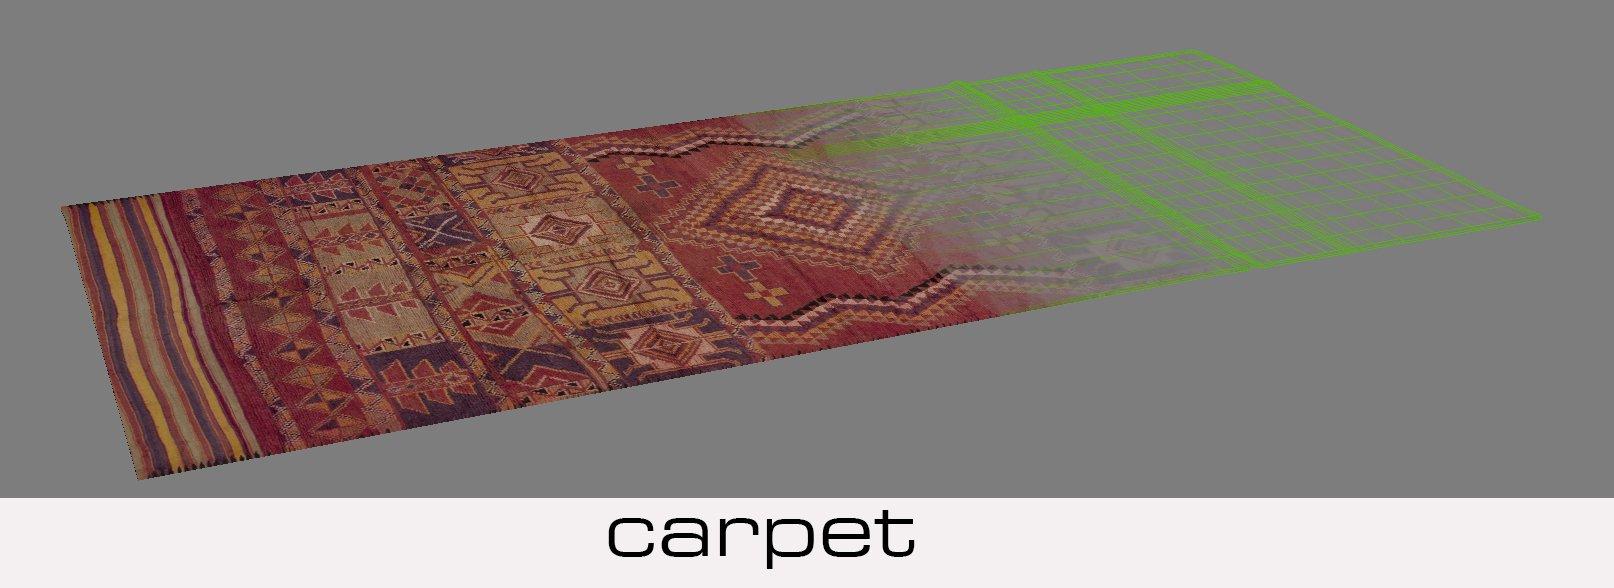 items_11_carpet_900_01051.jpg